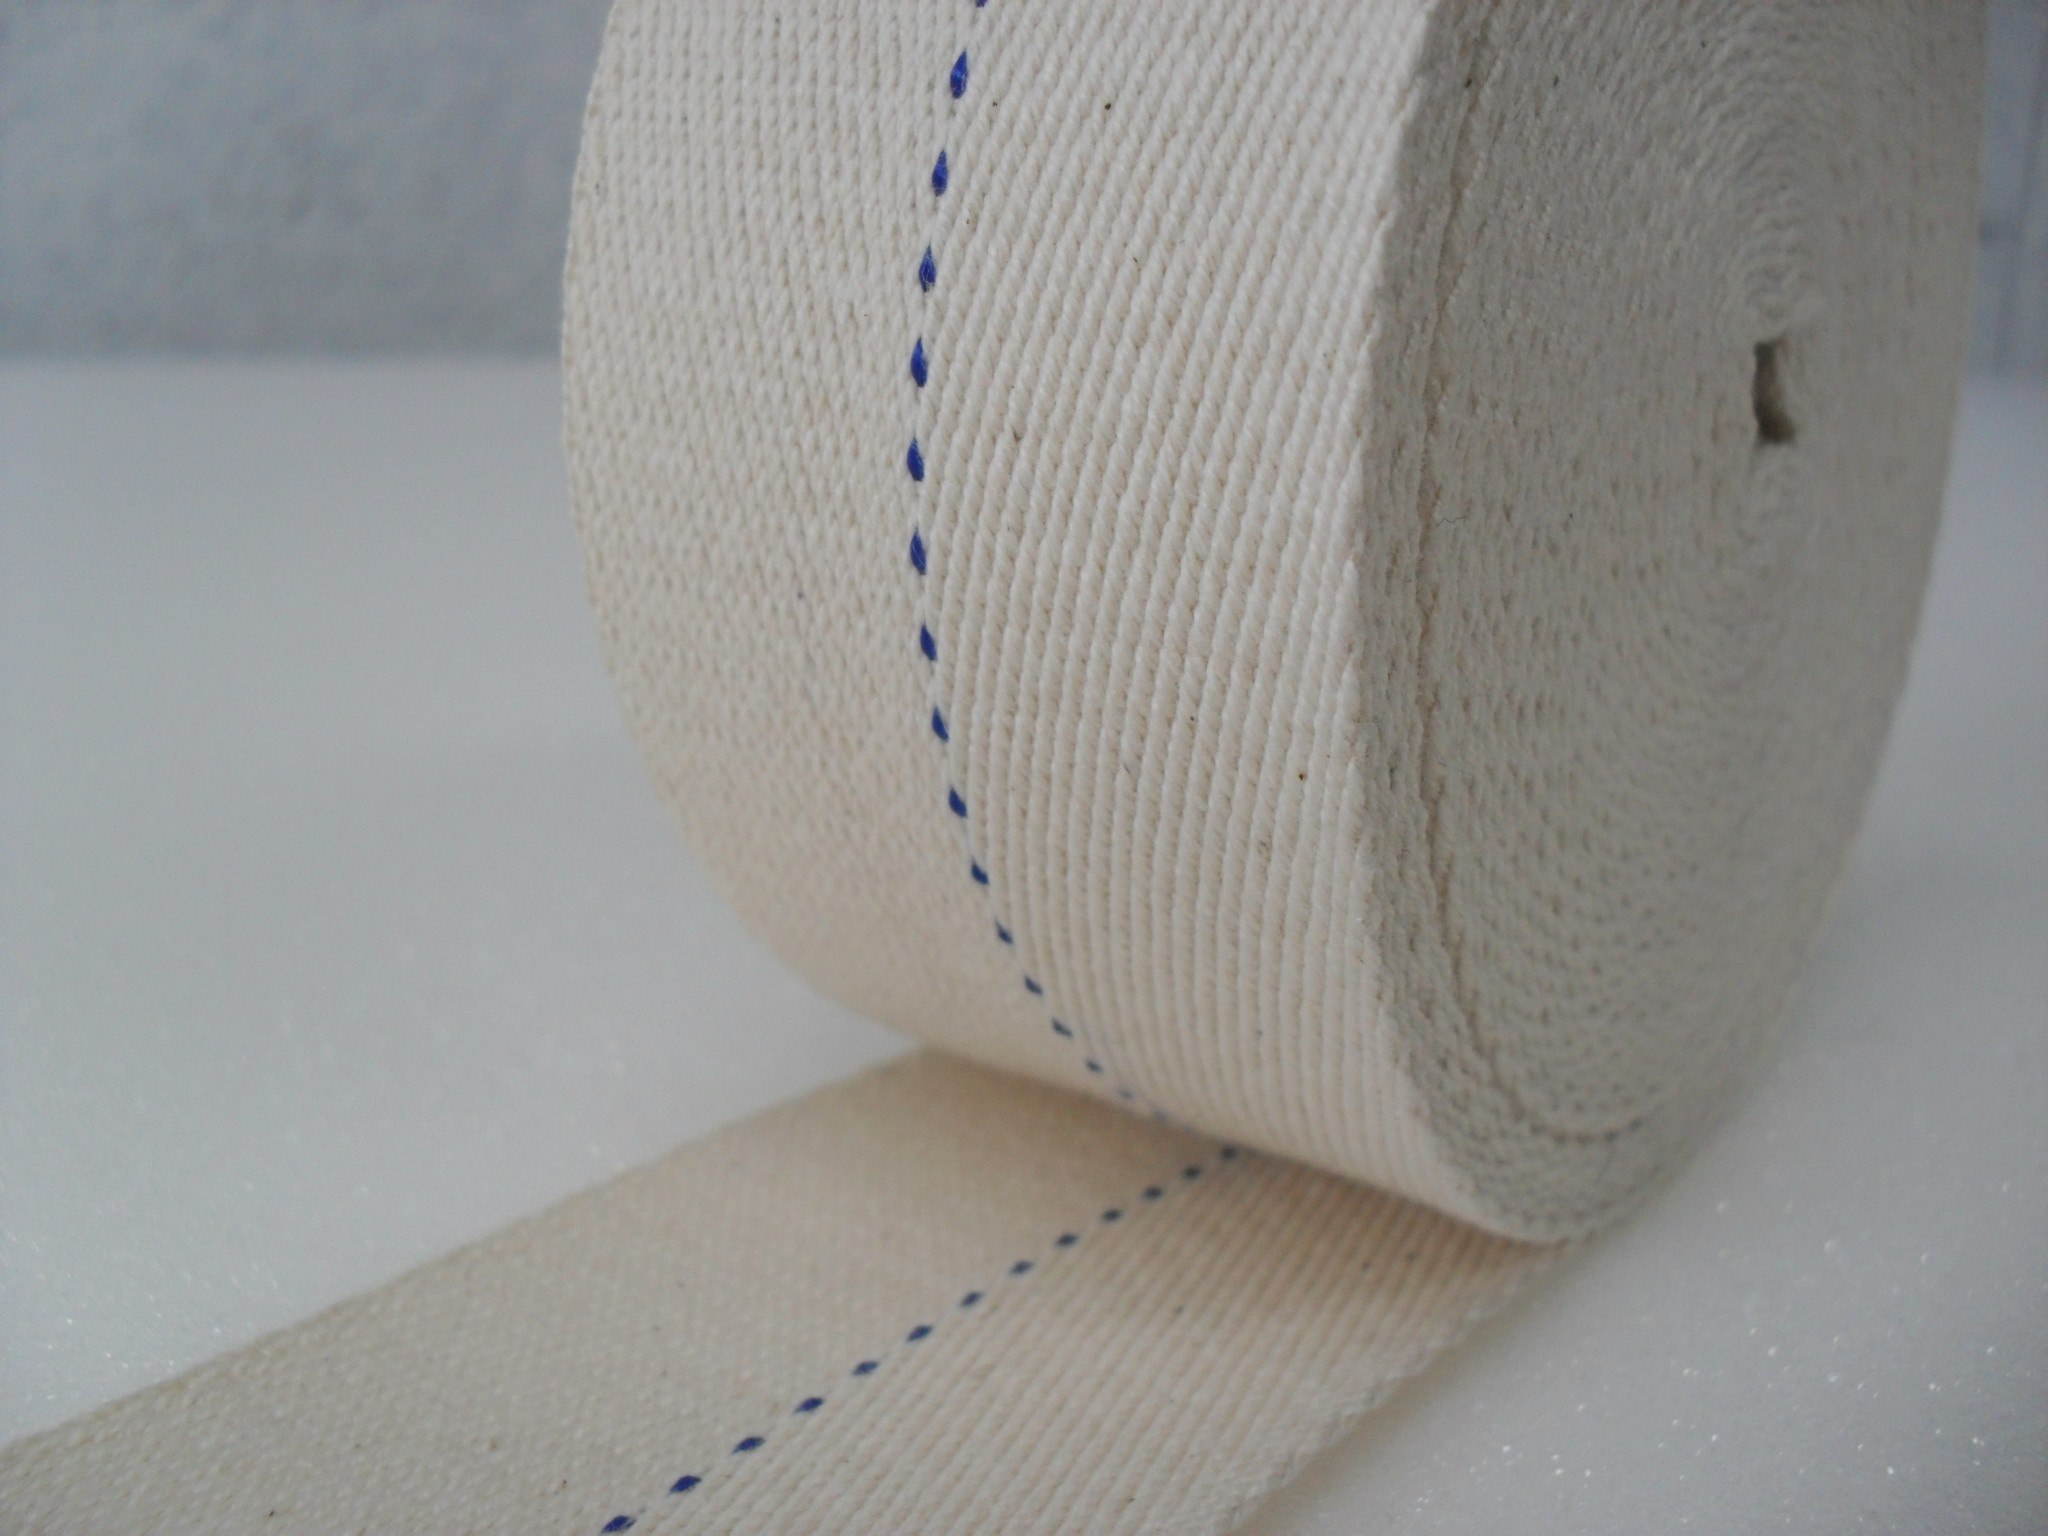 furniture-protection-cover-herringbone-webbing-20m-roll-1